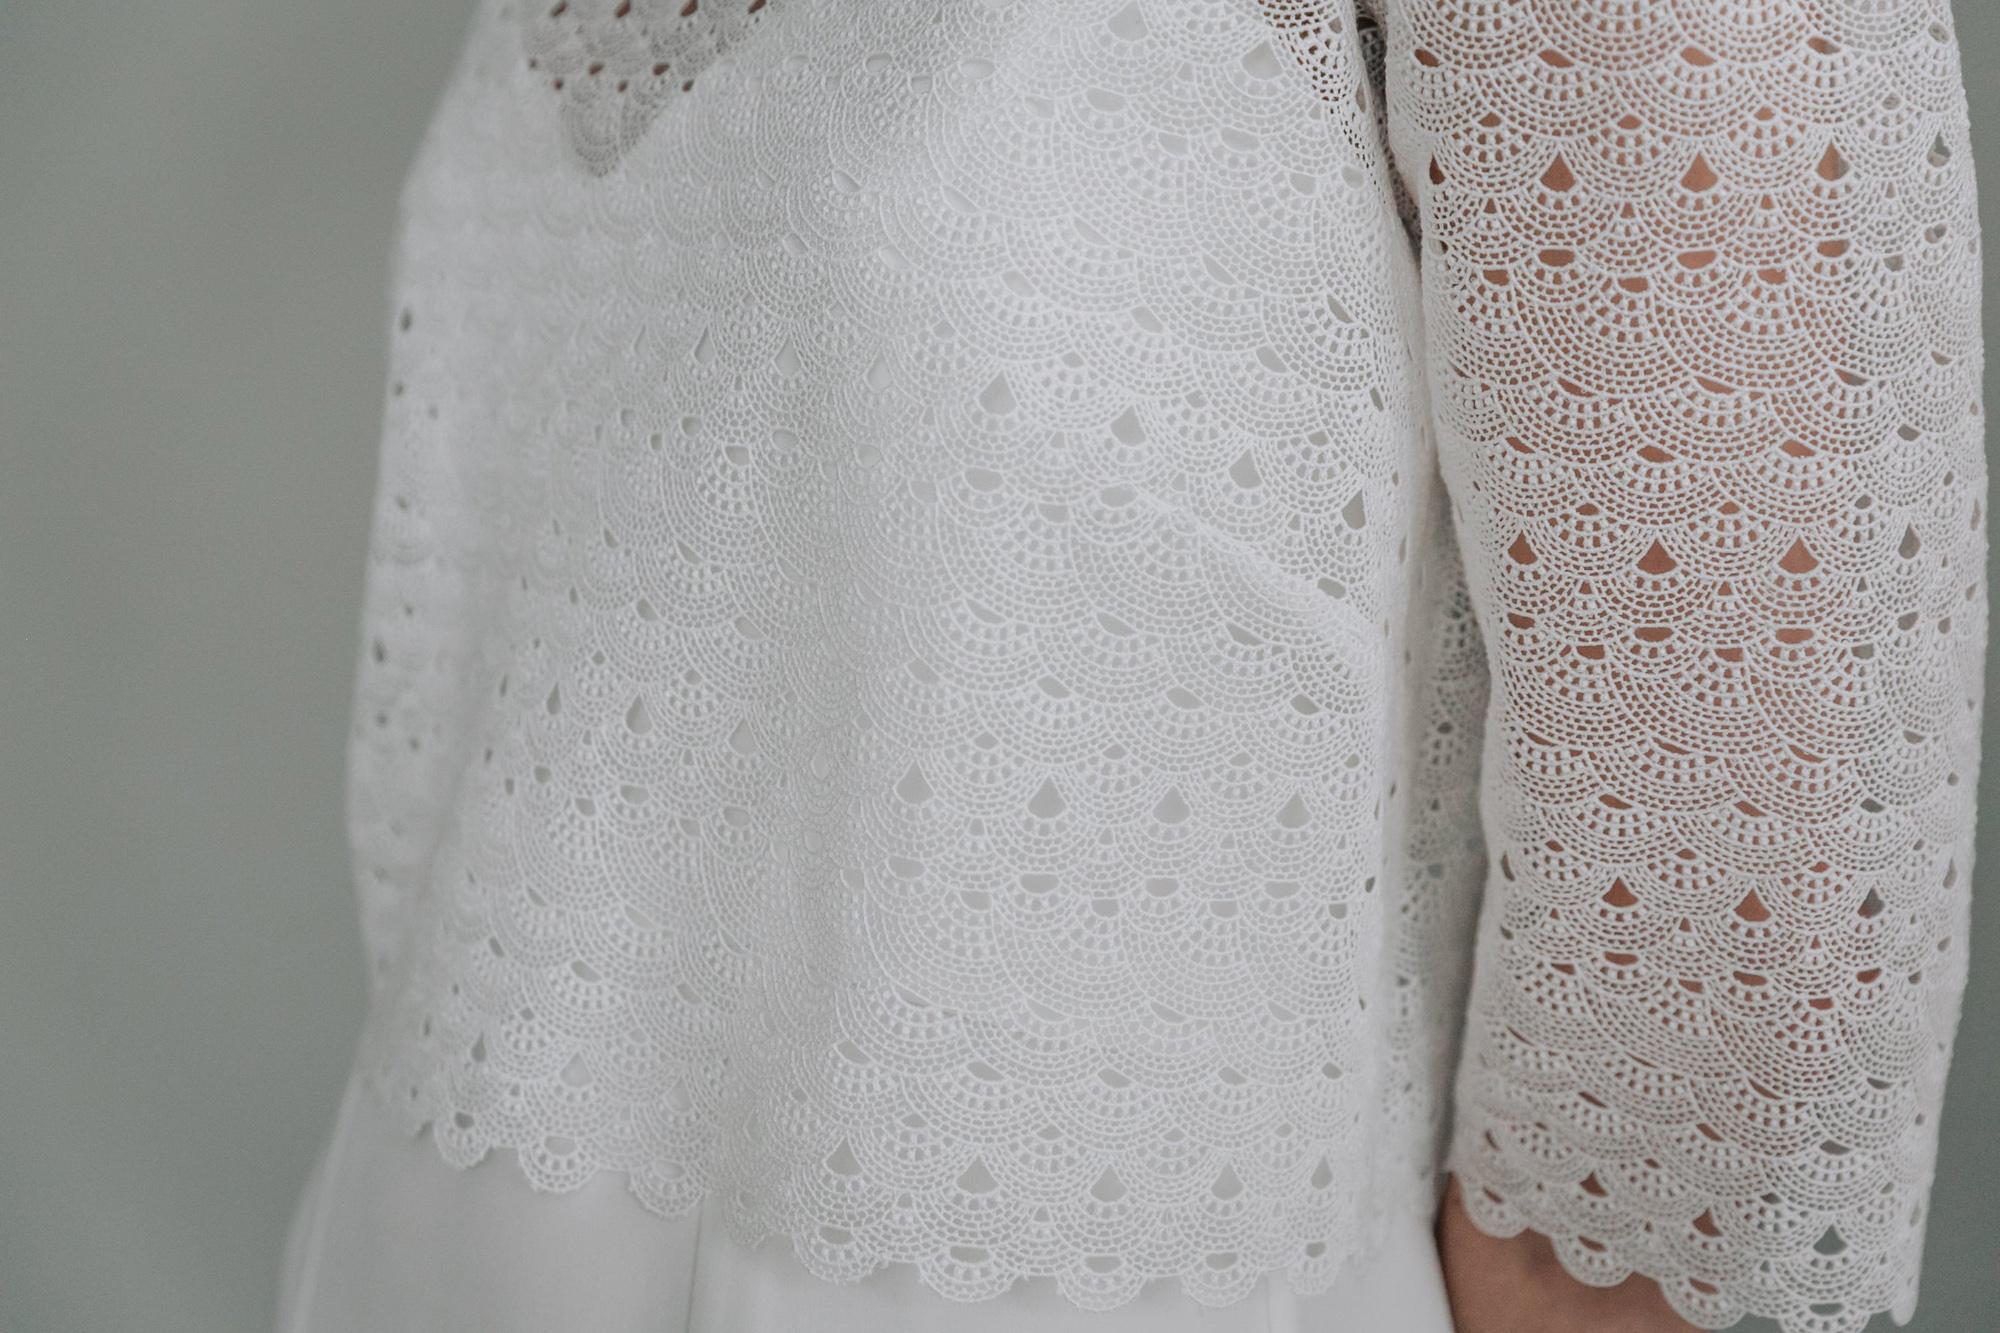 Kate-Beaumont-Sheffield-Freesia-Guipure-Lace-Jacket-Snowdrop-Minimal-Modern-Elegant-Matt-Silk-Wedding-Gown-5.jpg